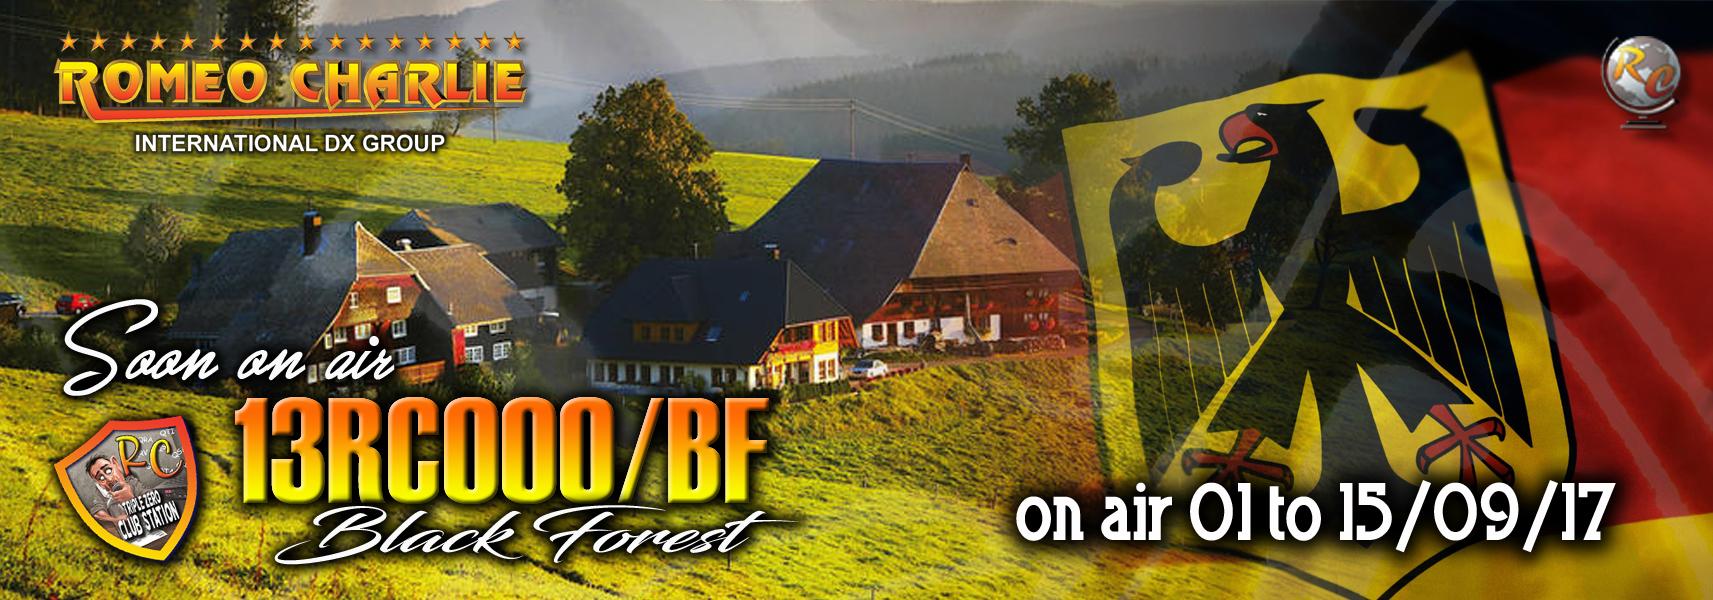 banner 13rc000bf